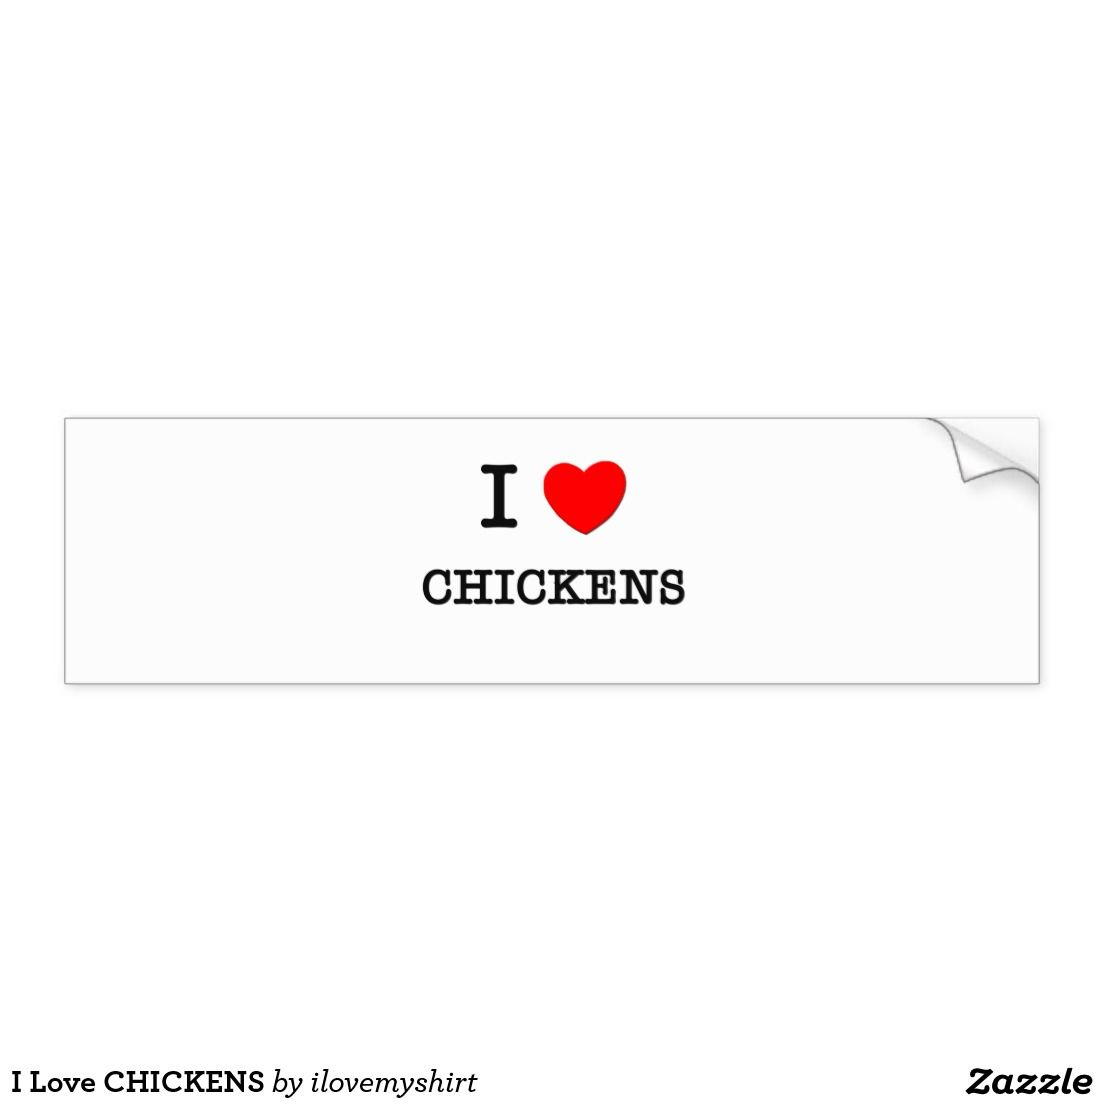 I Love Chickens Bumper Sticker Zazzle Com Car Bumper Stickers Bumper Stickers Strong Adhesive [ 1104 x 1104 Pixel ]